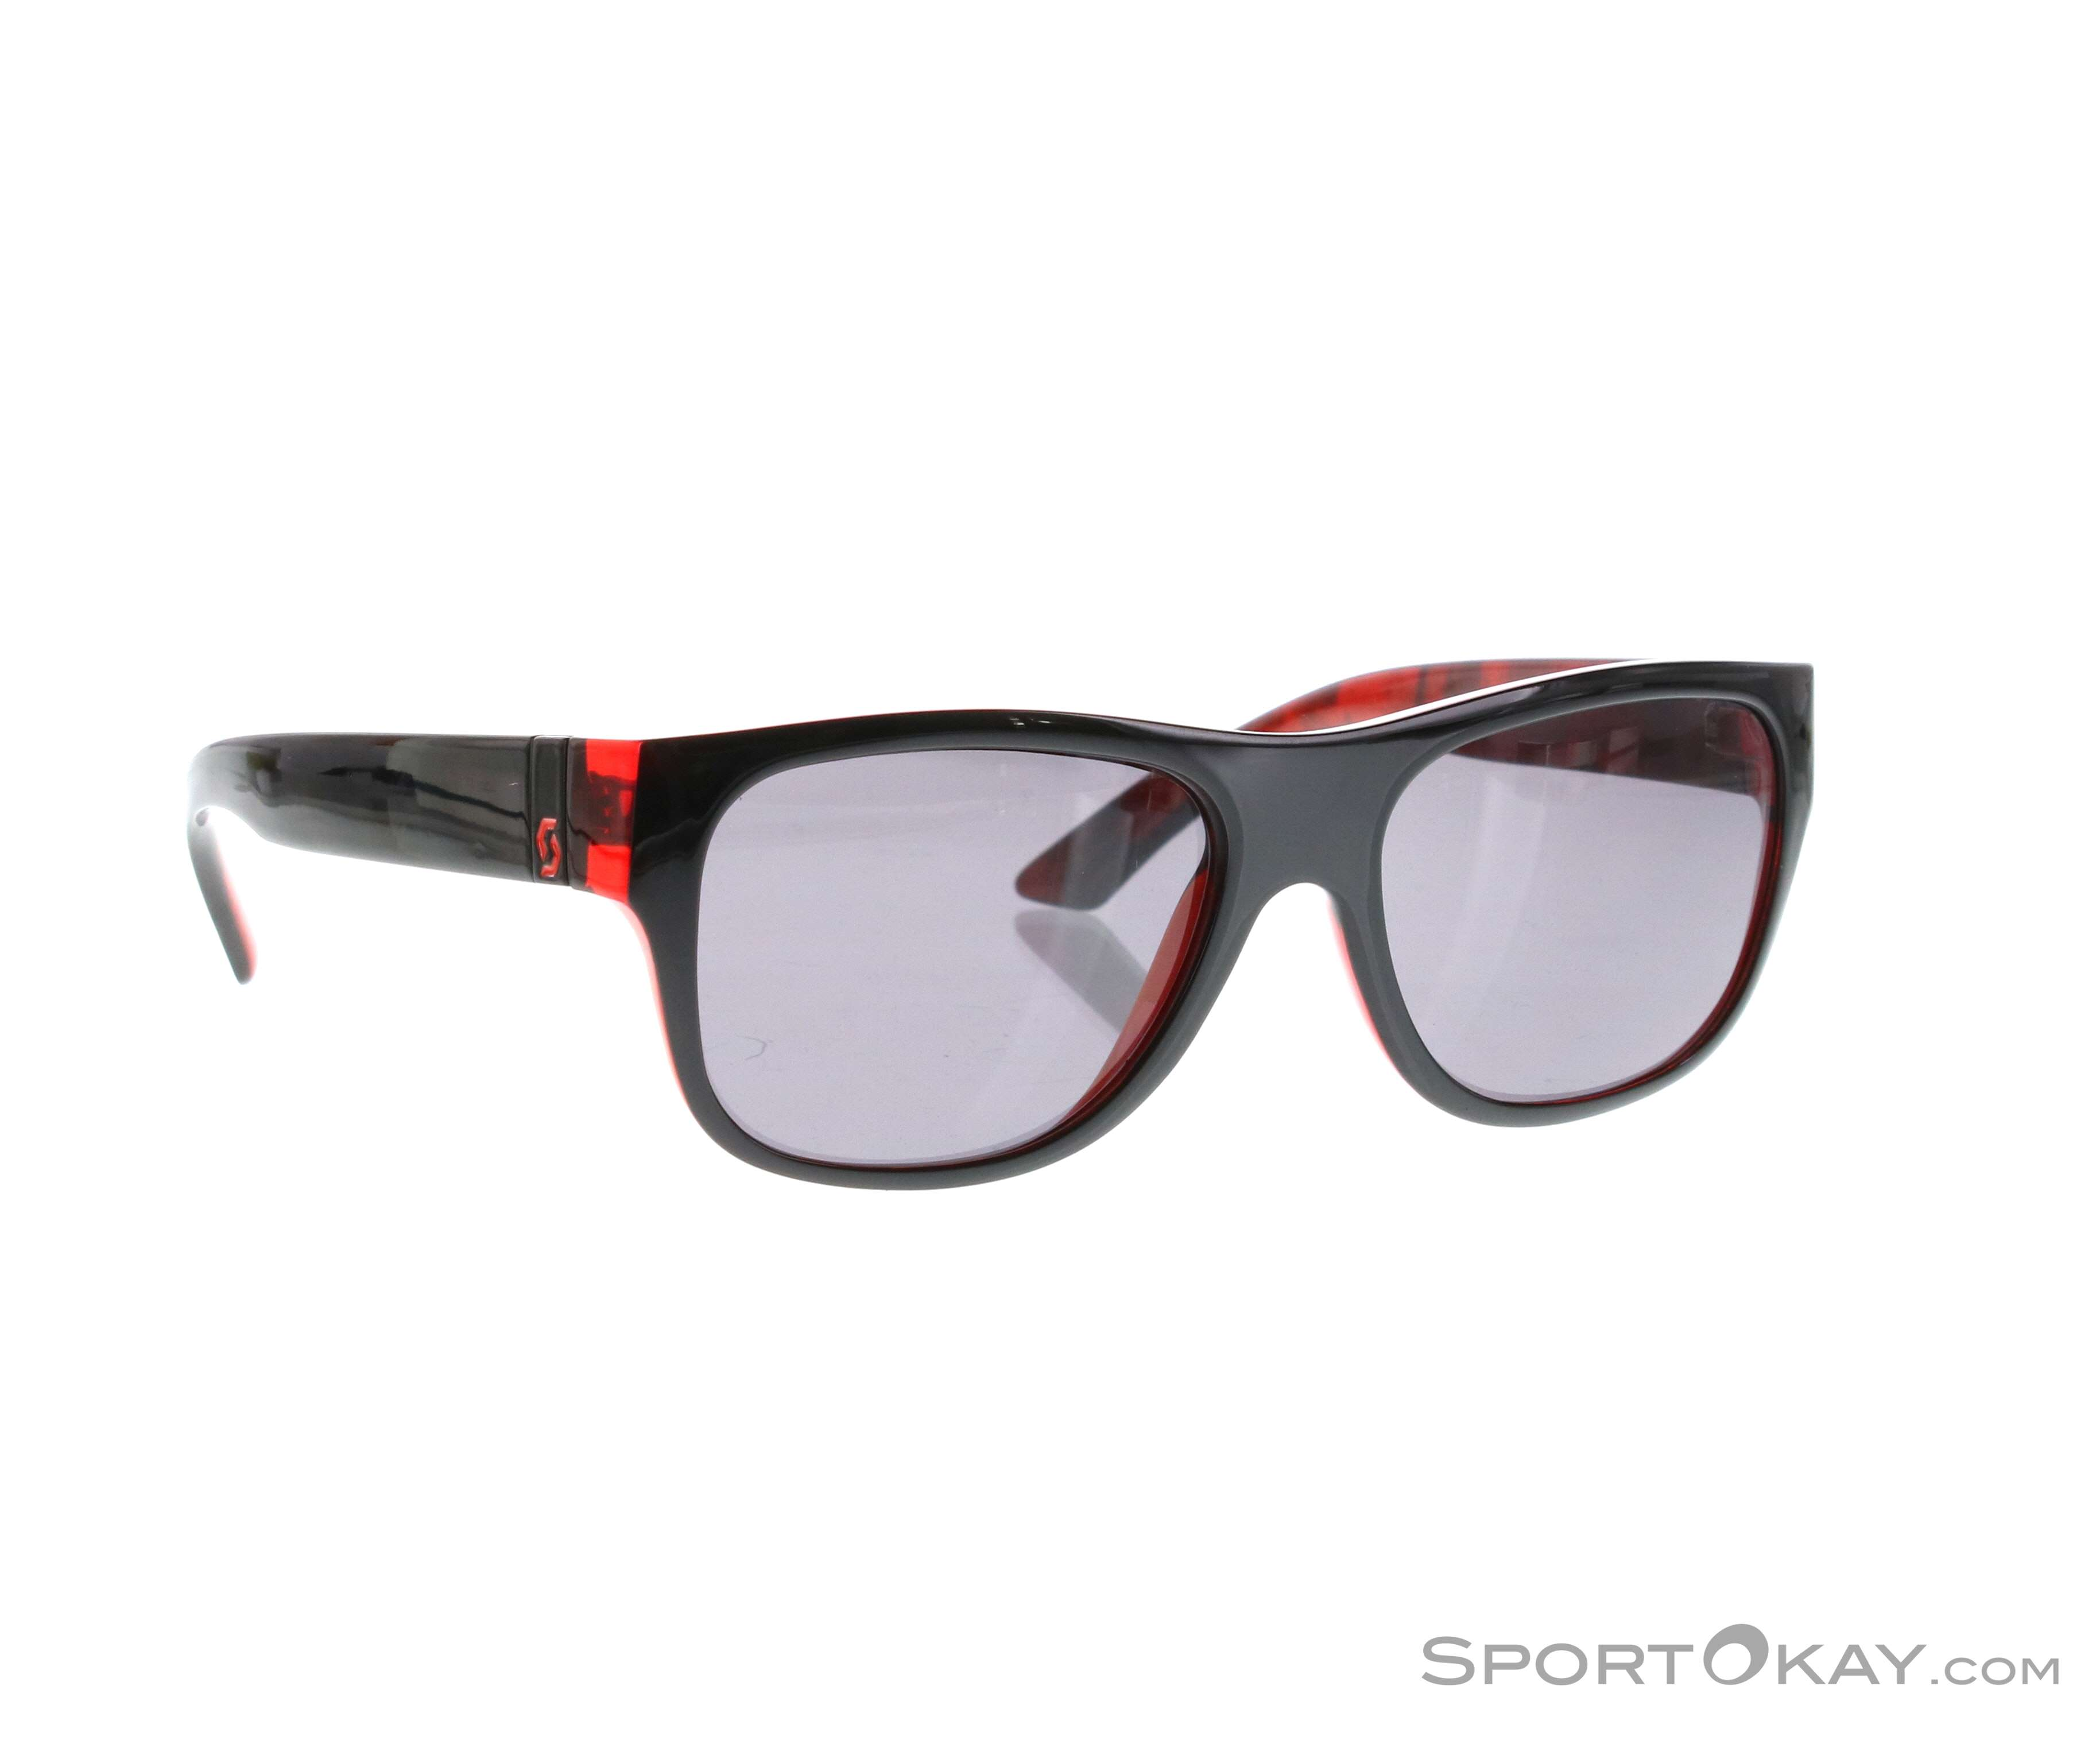 Scott Lyric Sunglasses tFxiKv1DUc